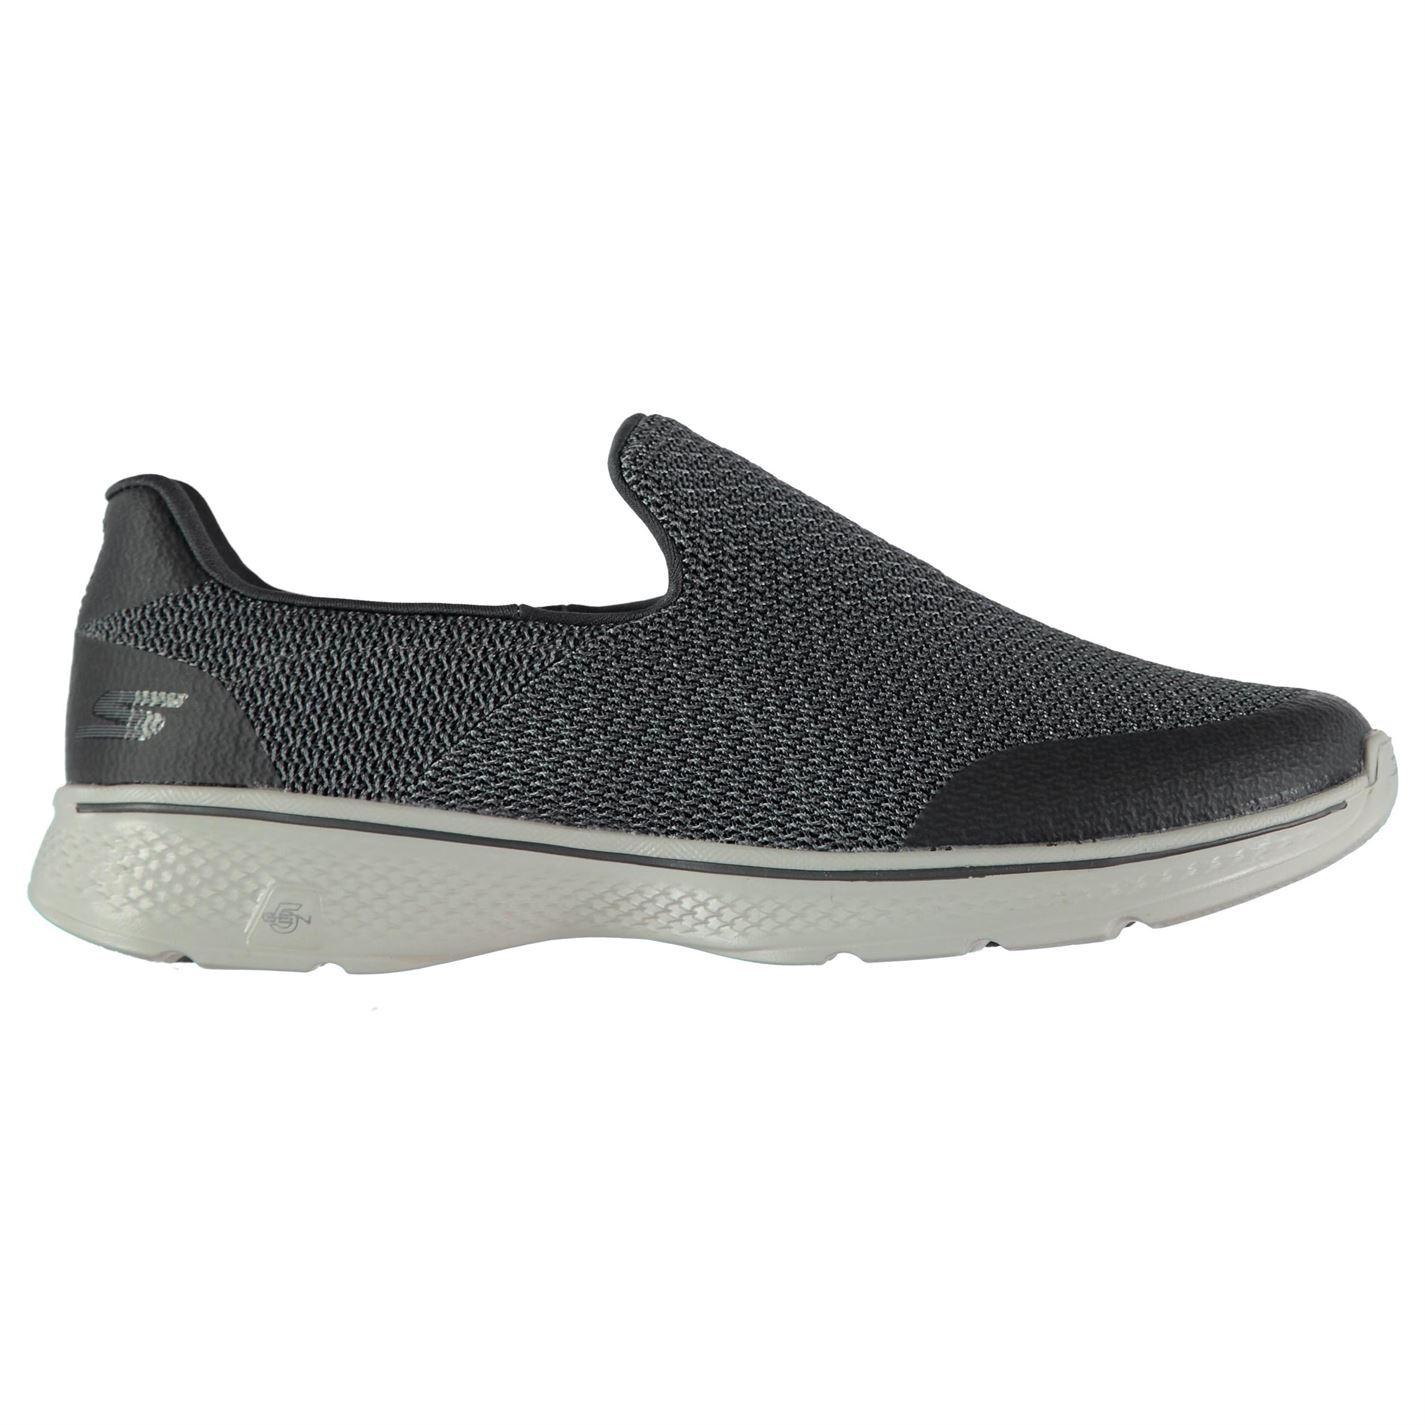 Skechers Go Walk 4 Shoes Mens Footwear Trainers Sneakers | eBay